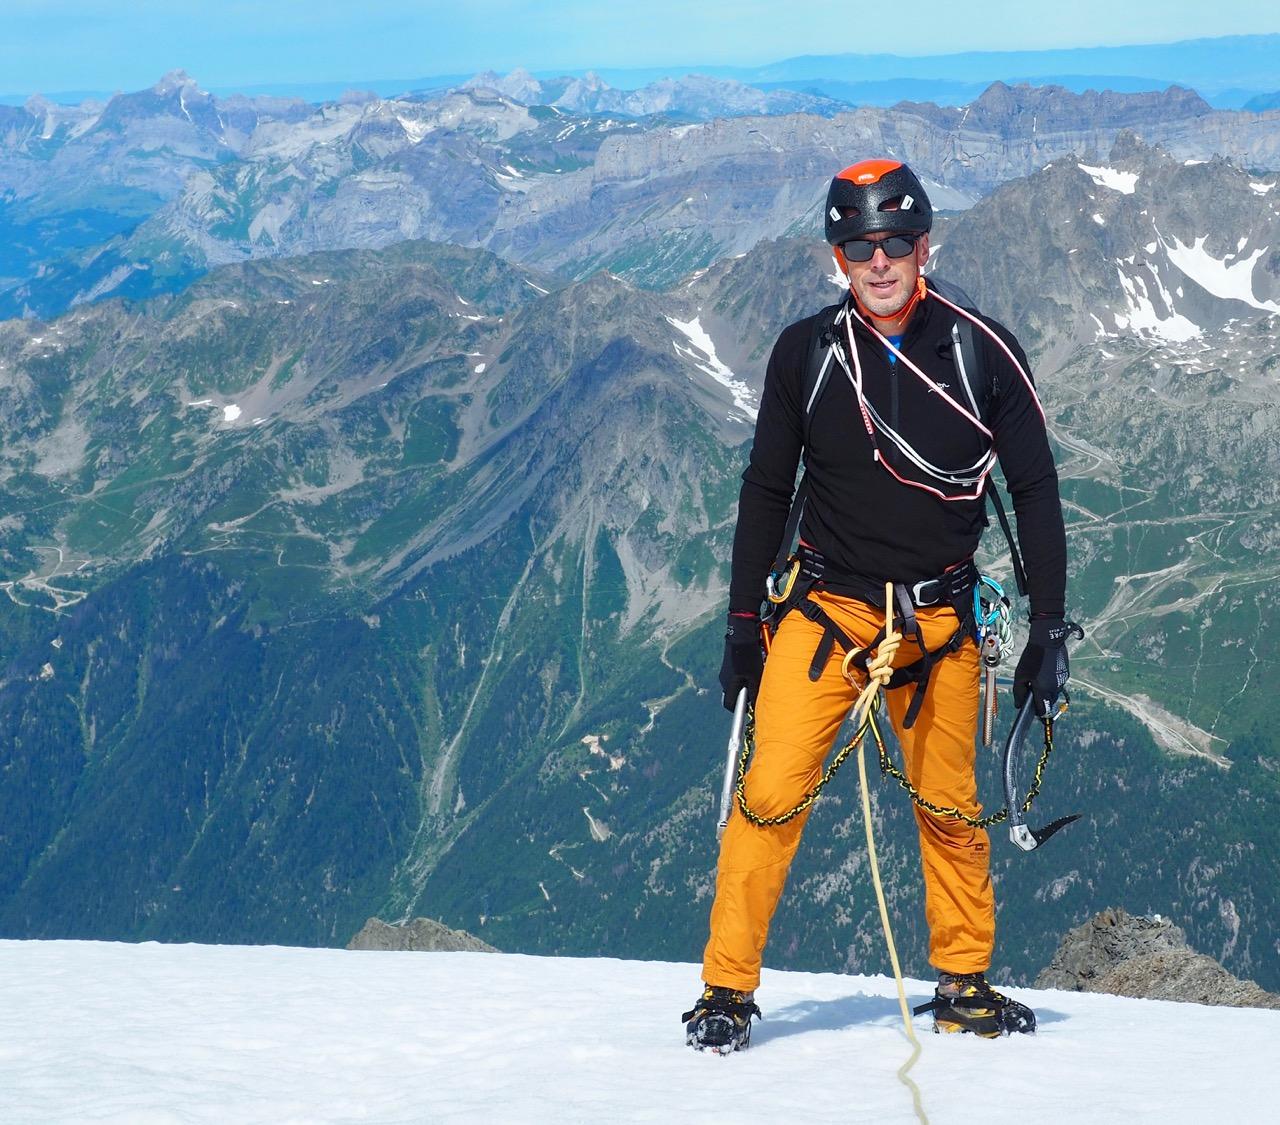 Chamonix Mountain Day & Matterhorn Preparation – June 2017